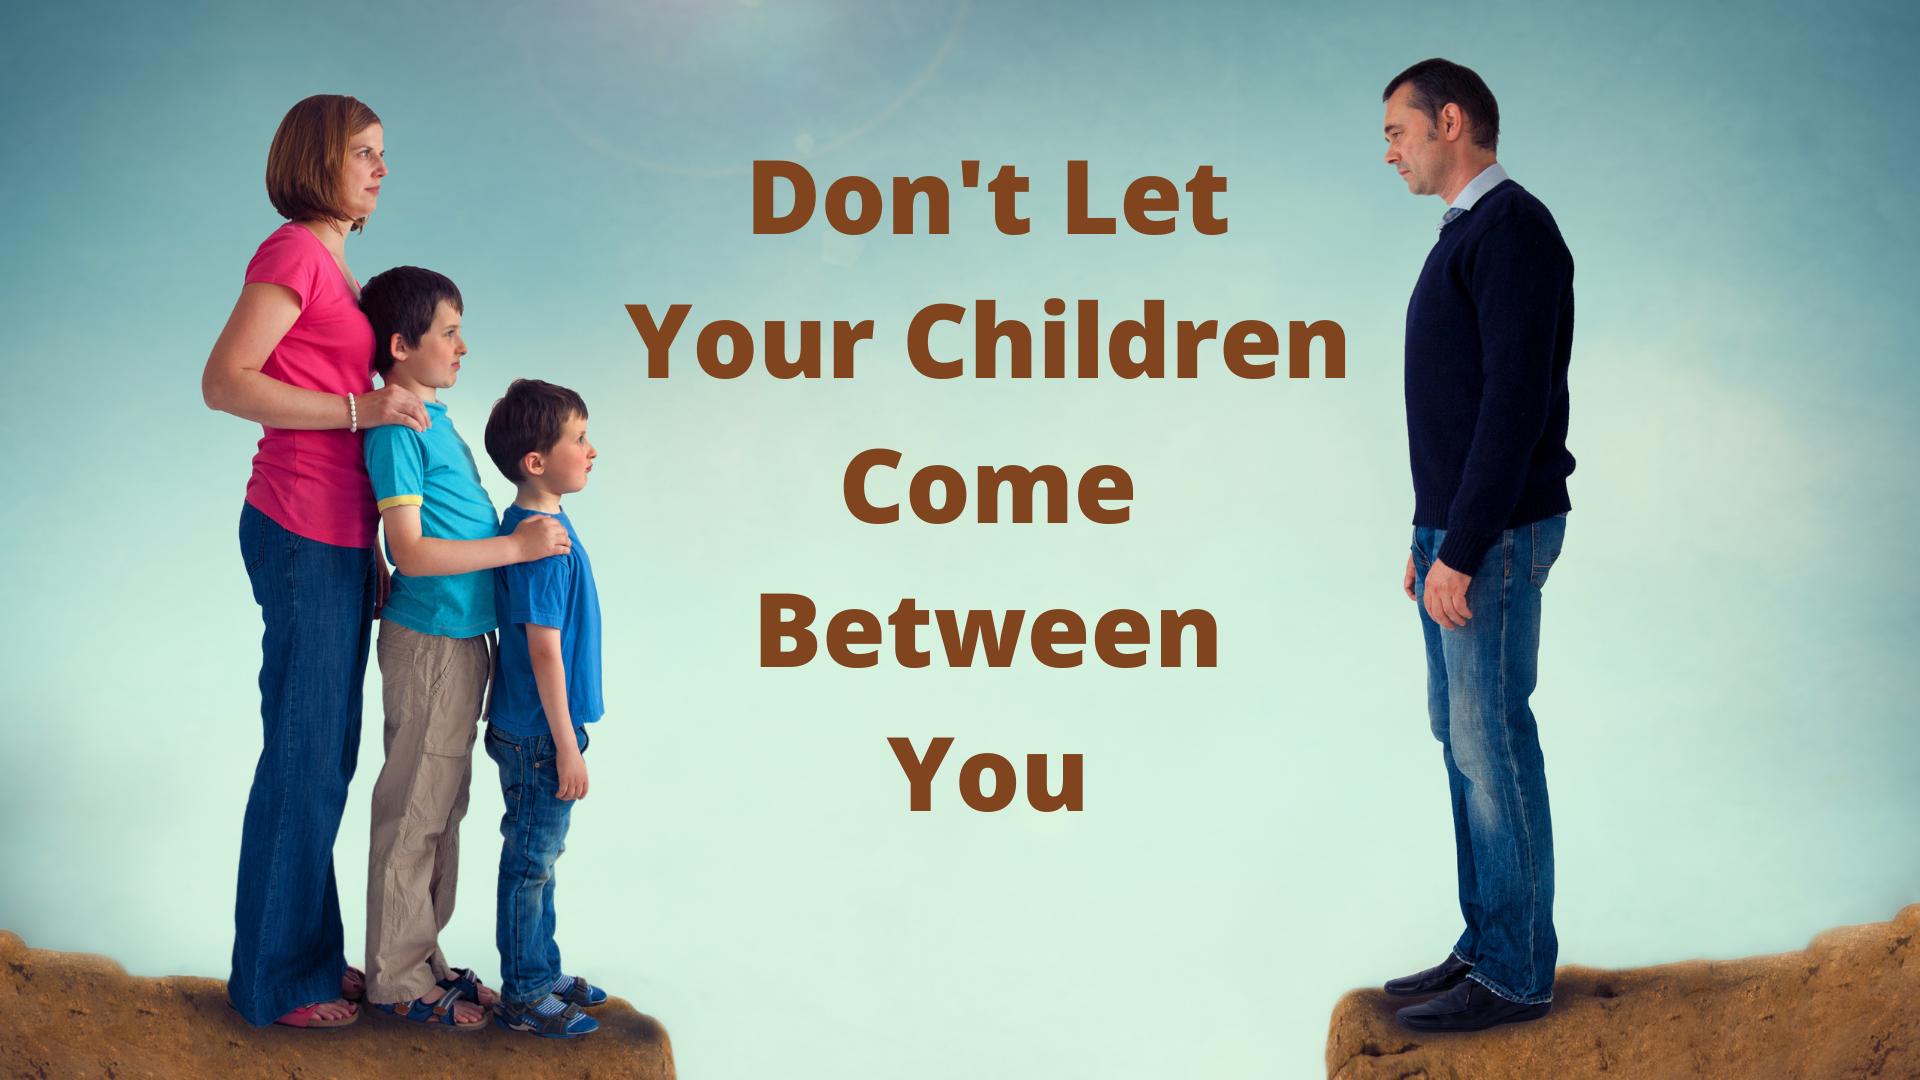 Don't Let Your Children